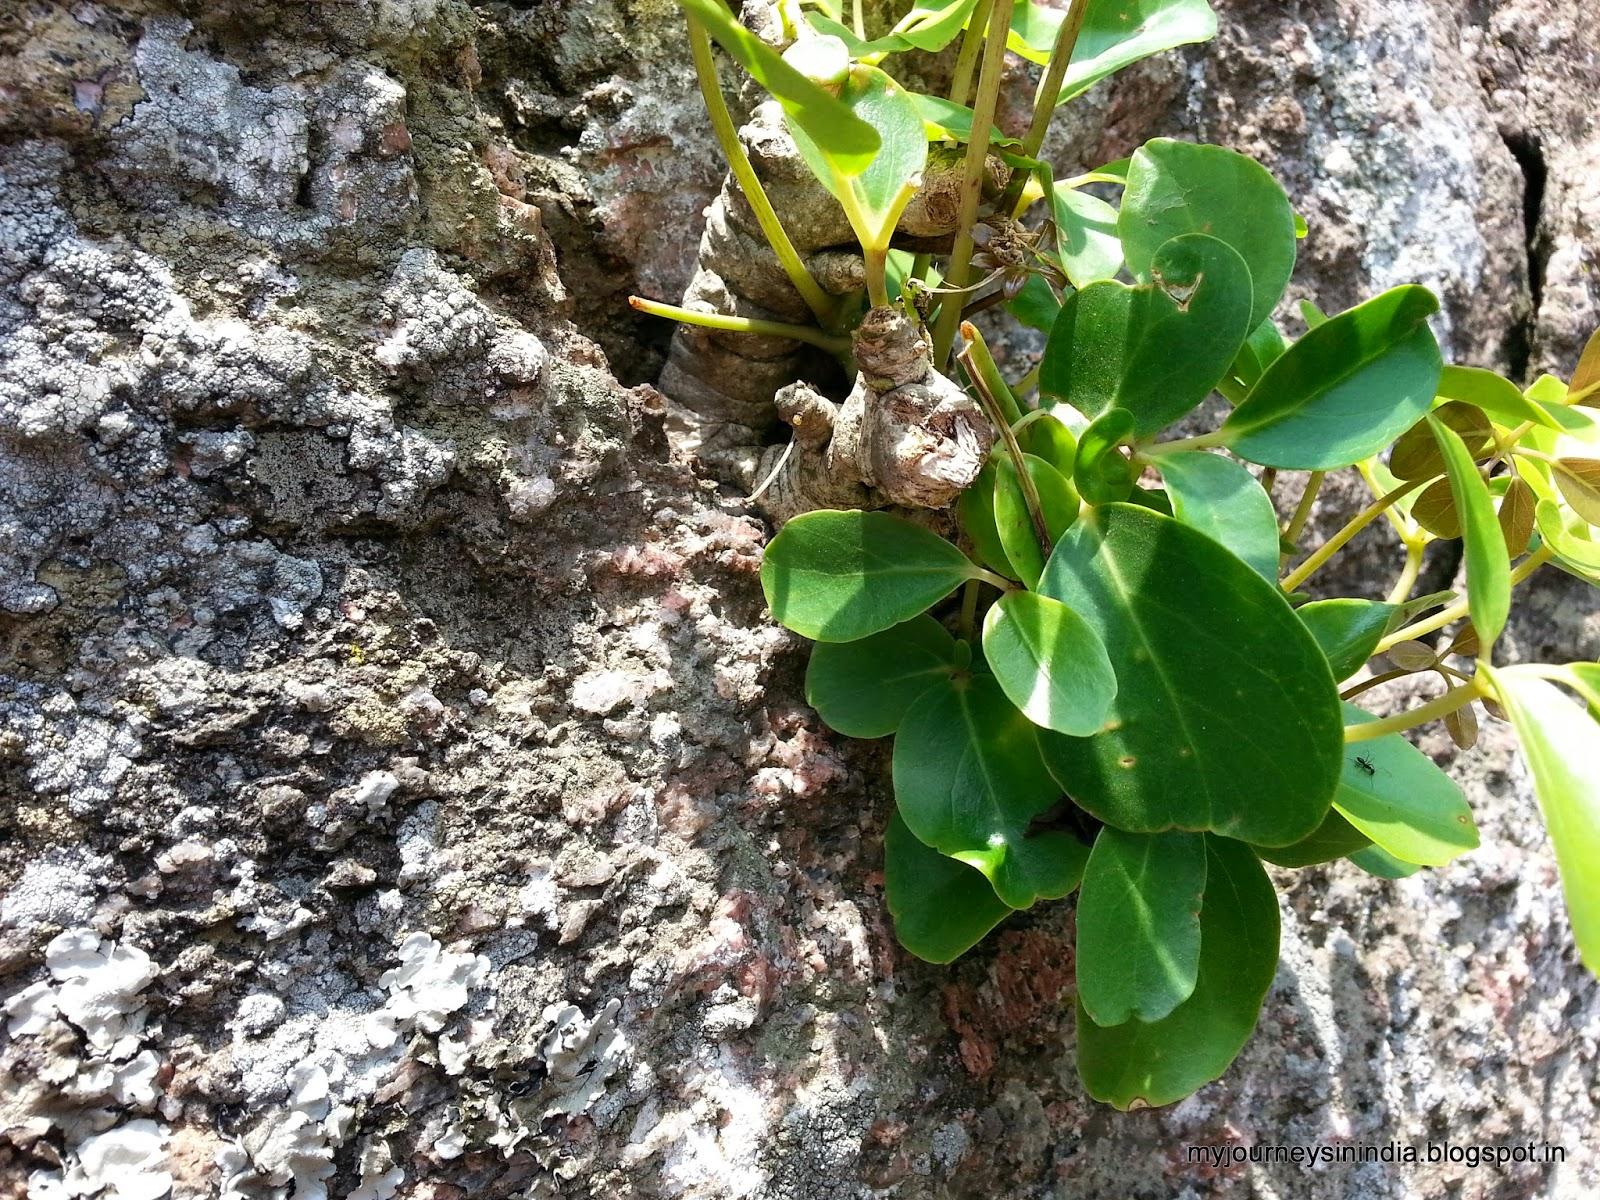 Trees growing on rocks - Shivagange